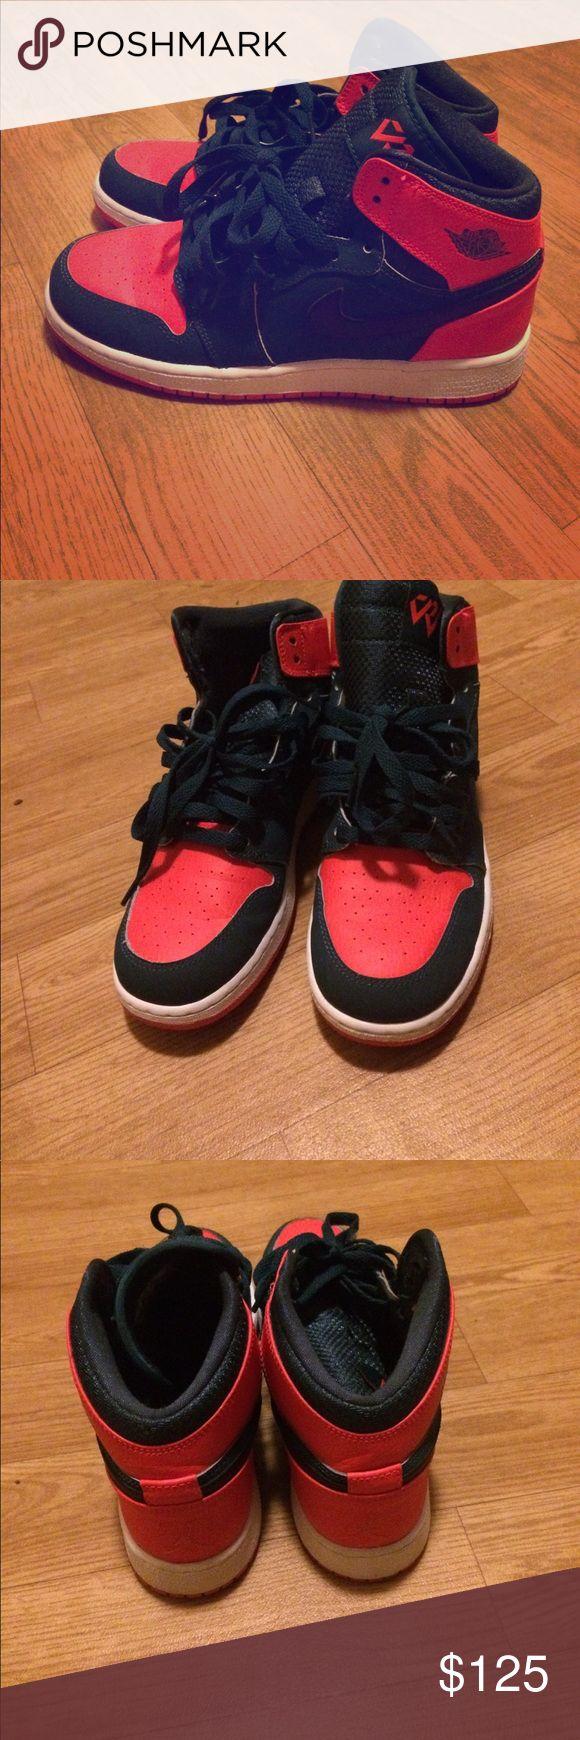 "AIR JORDAN 1 RETRO HIGH ""RUSSELL WESTBROOK"" AIR JORDAN 1 HIGH TOP RUSSELL WESTBROOK ORANGE TEAL CORAL Air Jordan Shoes Sneakers"